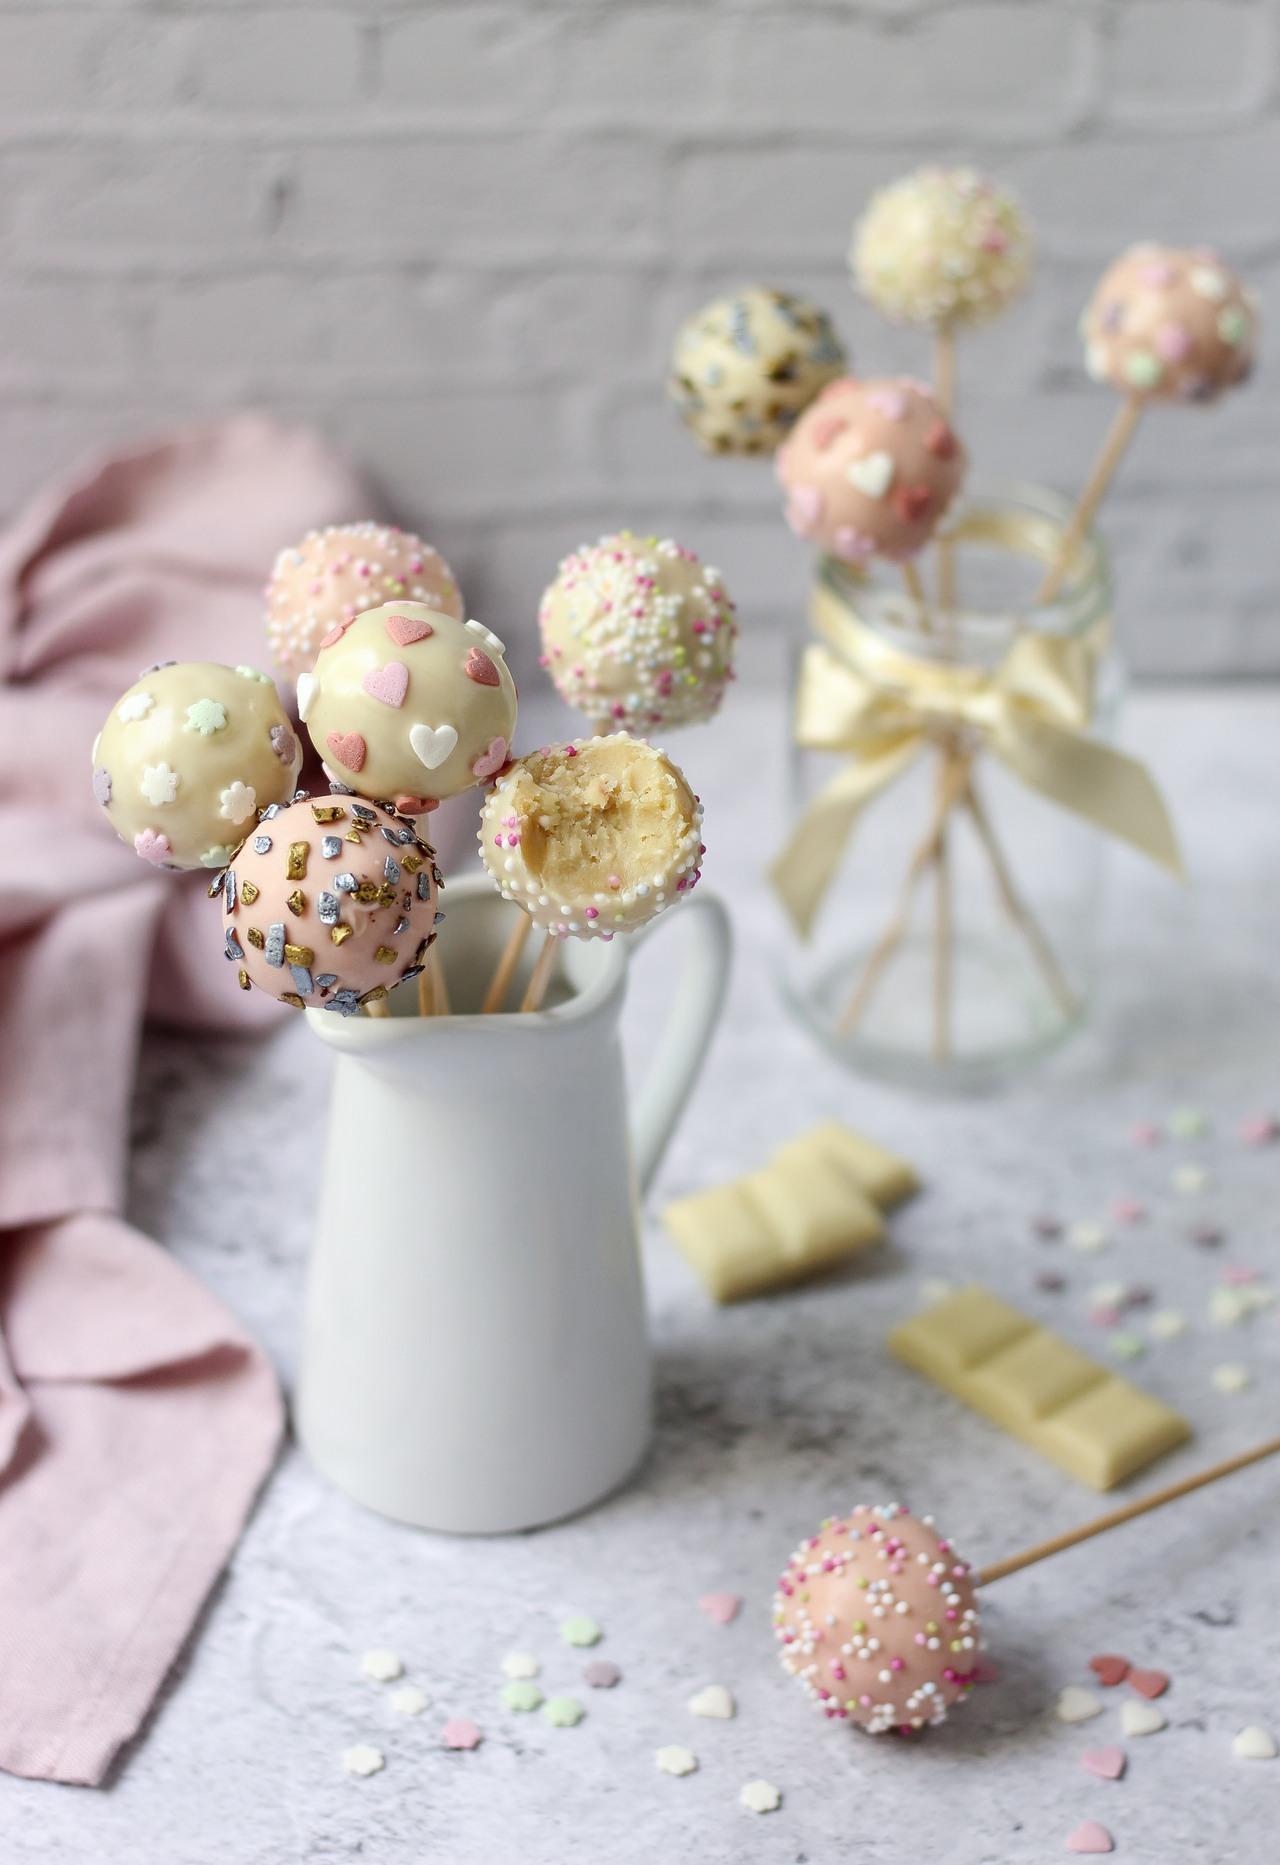 Kejk pops (cake pops) 2